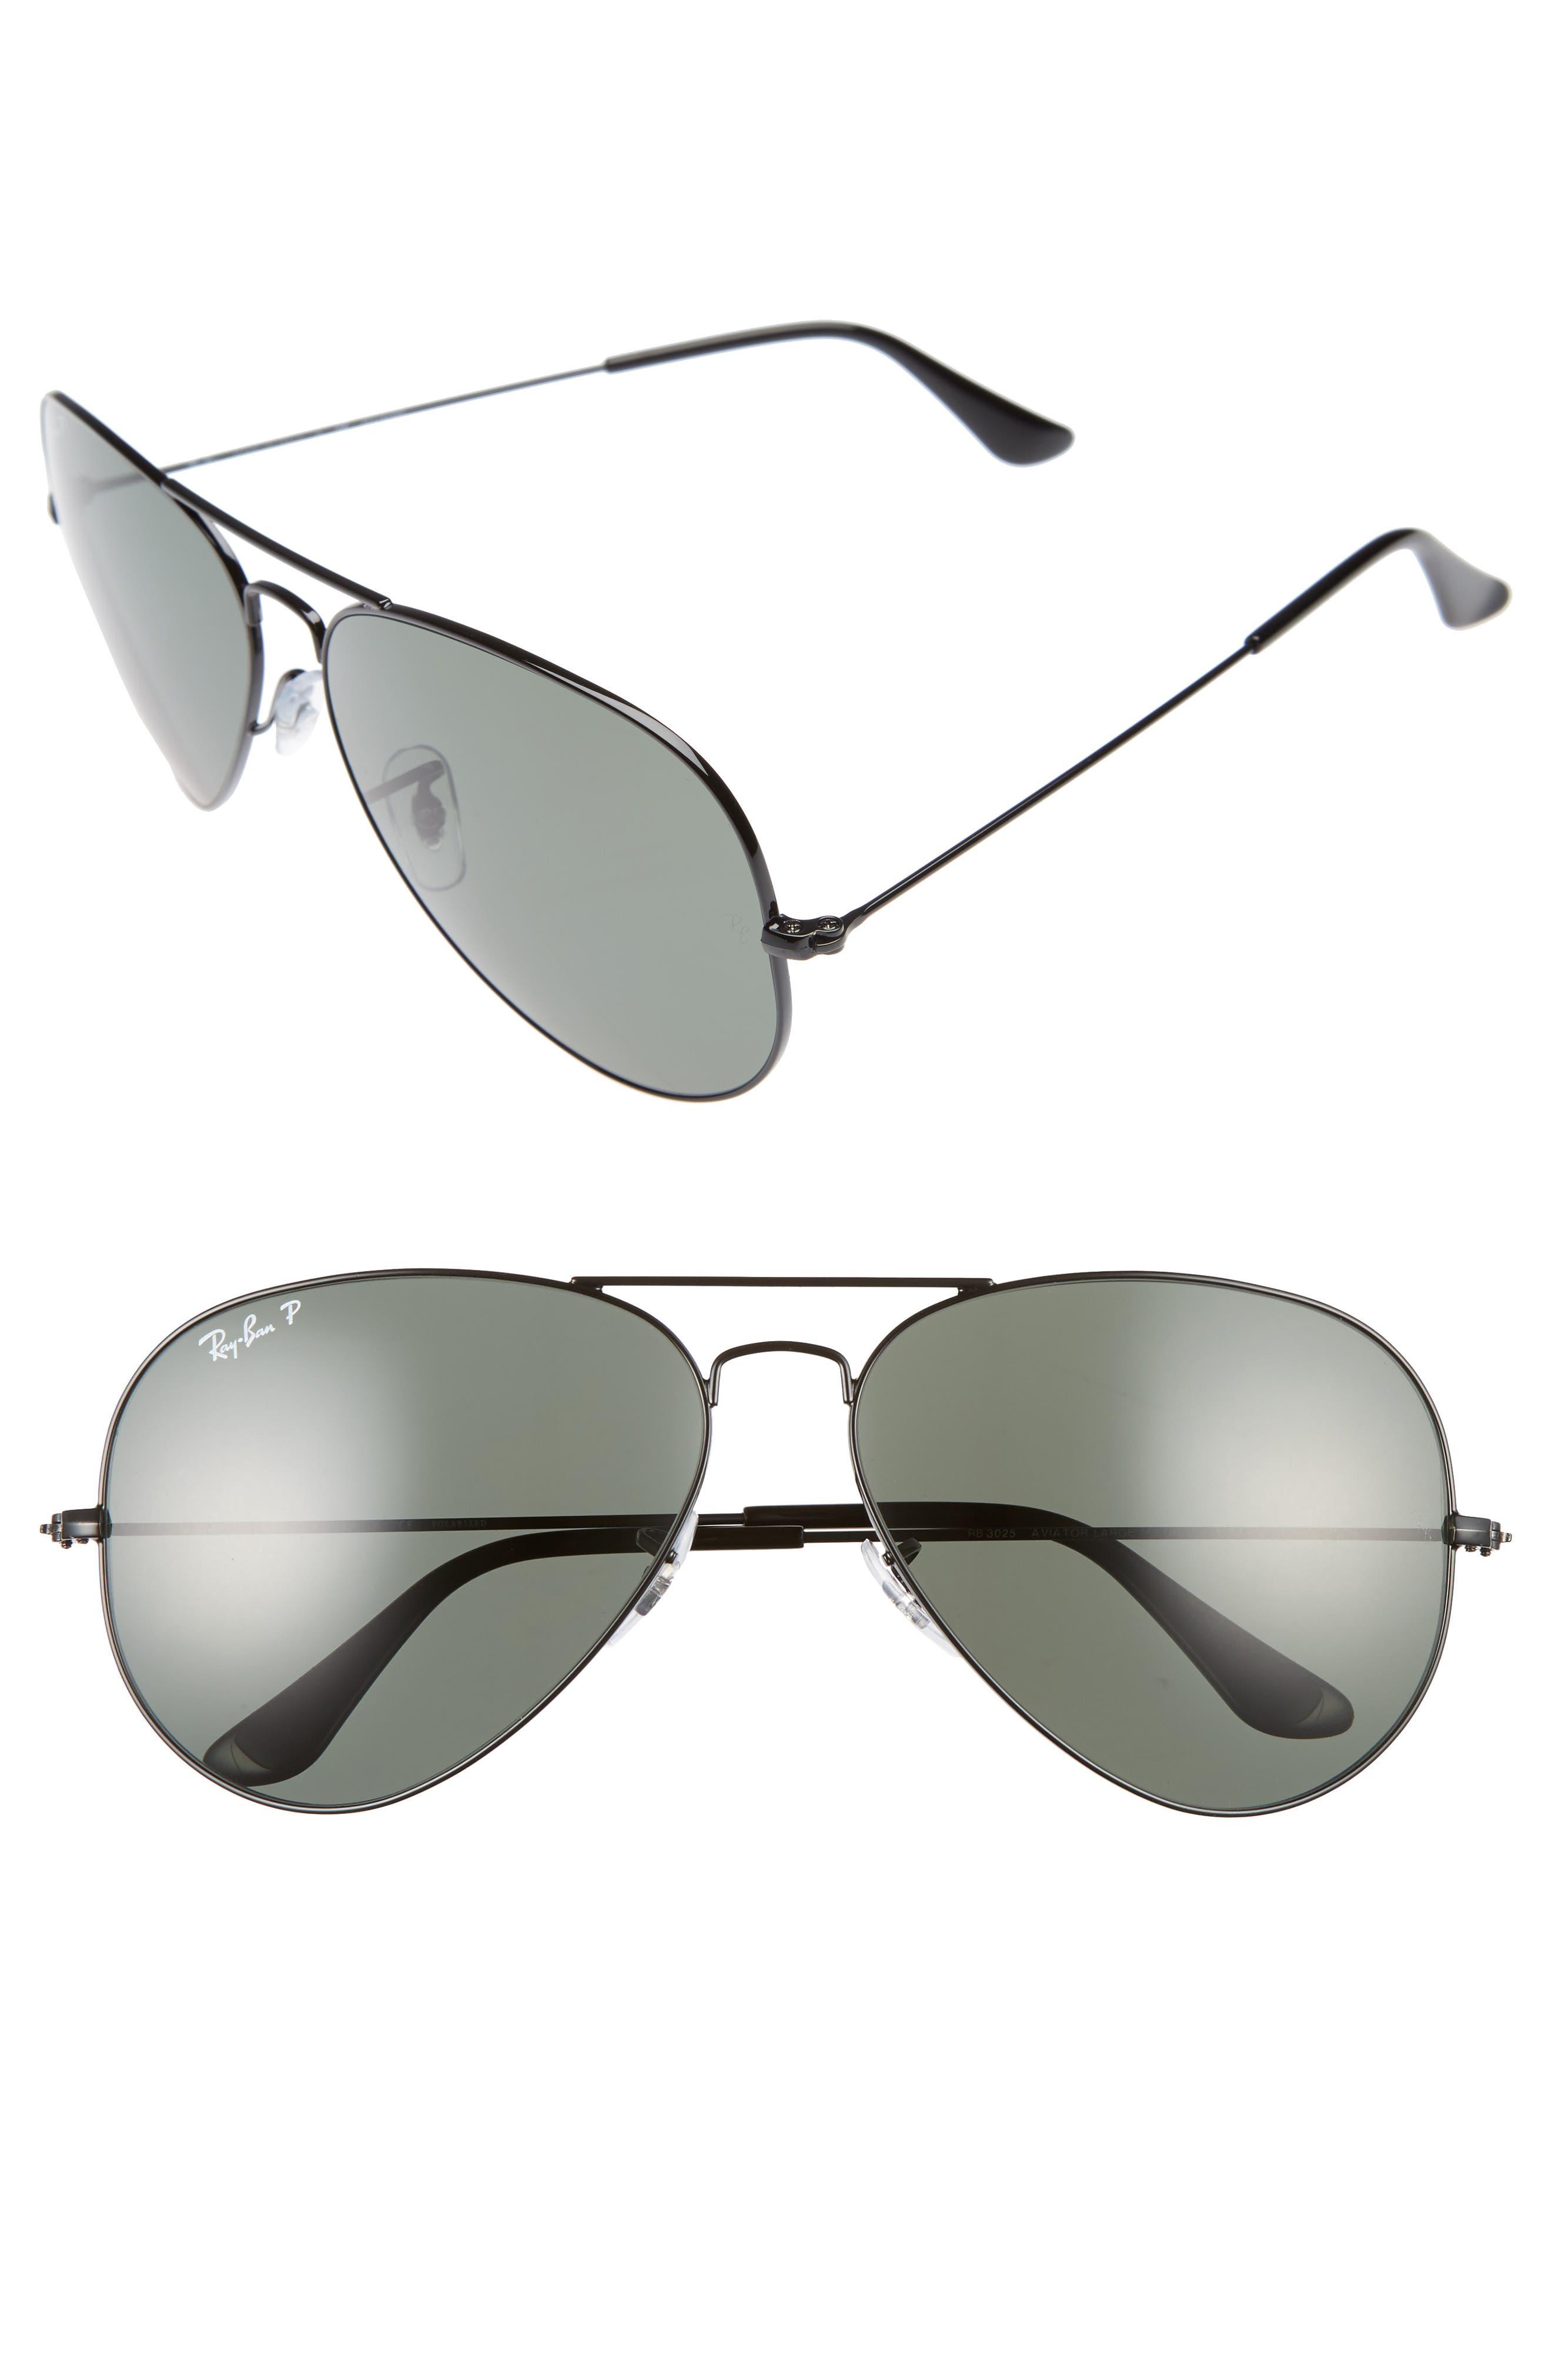 Icons 62mm Polarized Aviator Sunglasses,                         Main,                         color, Black